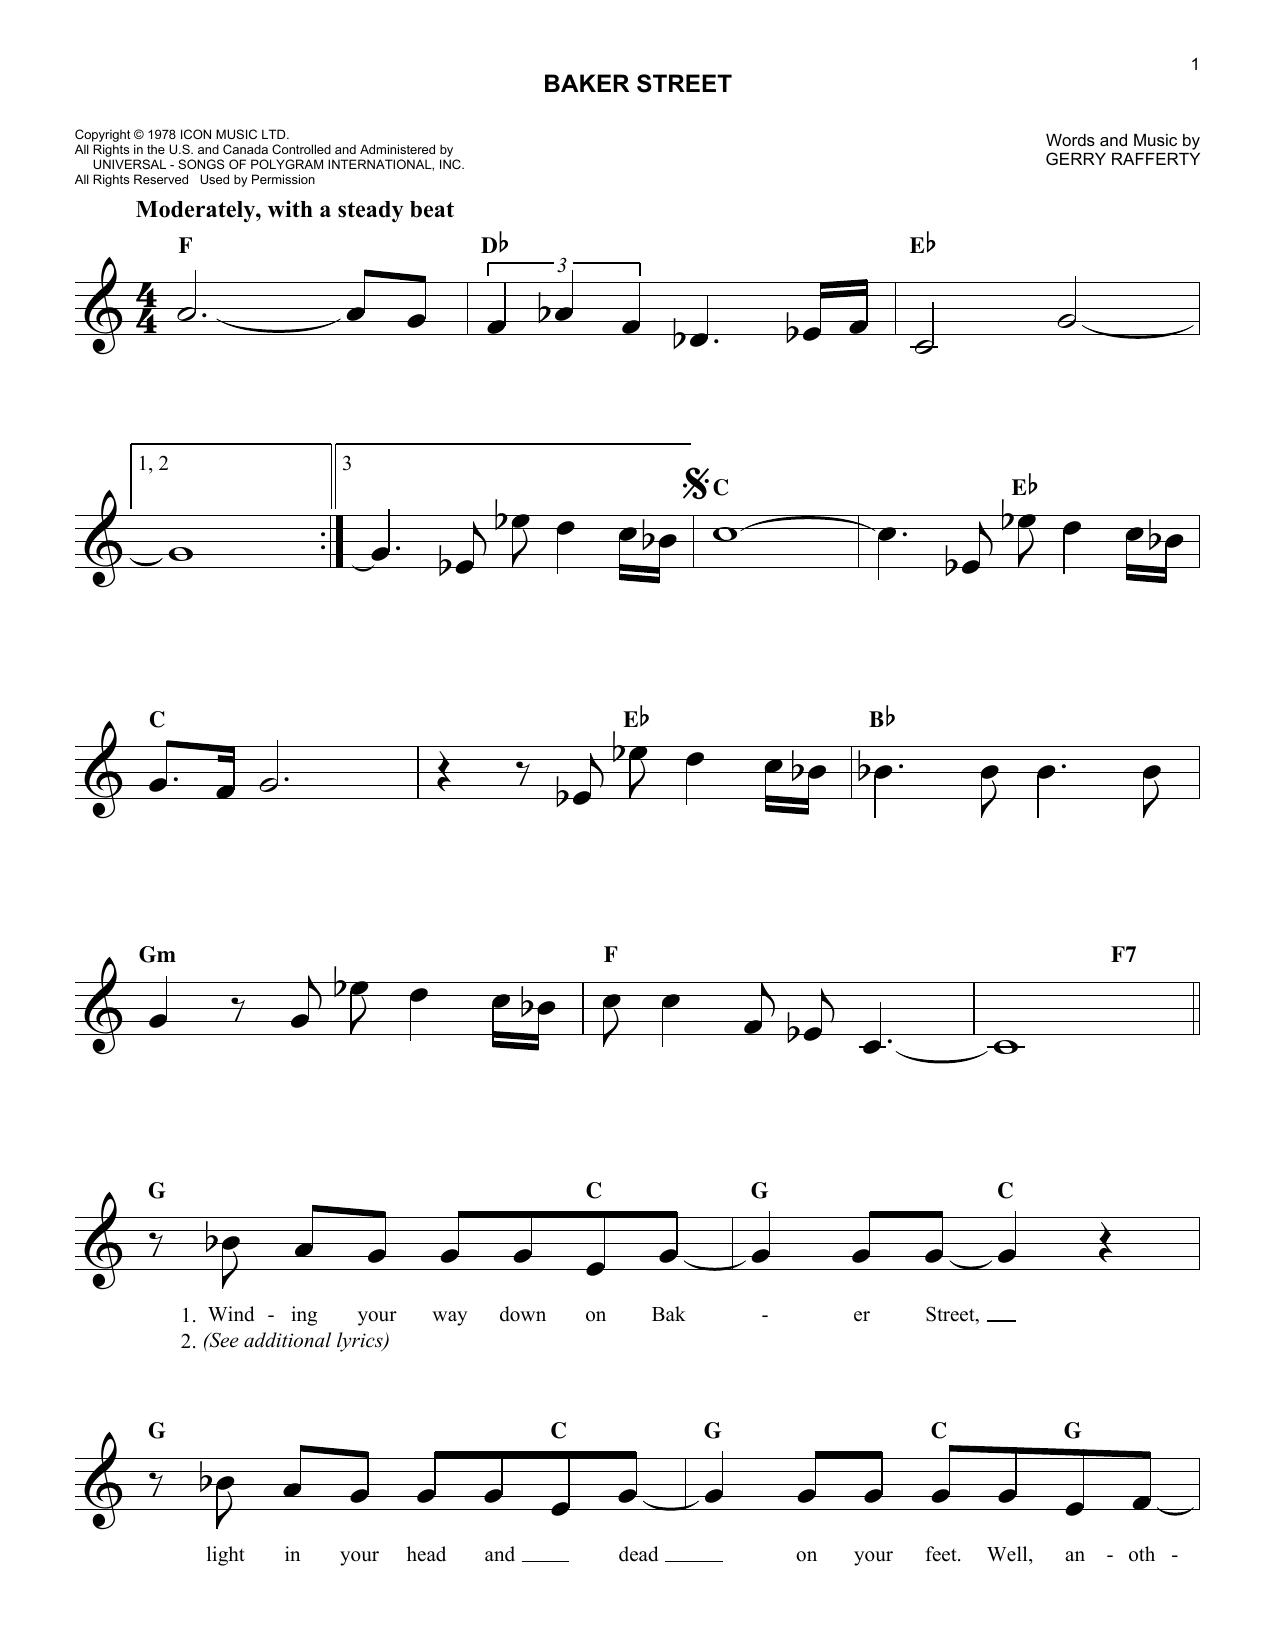 Sheet Music Digital Files To Print Licensed Gerry Rafferty Digital